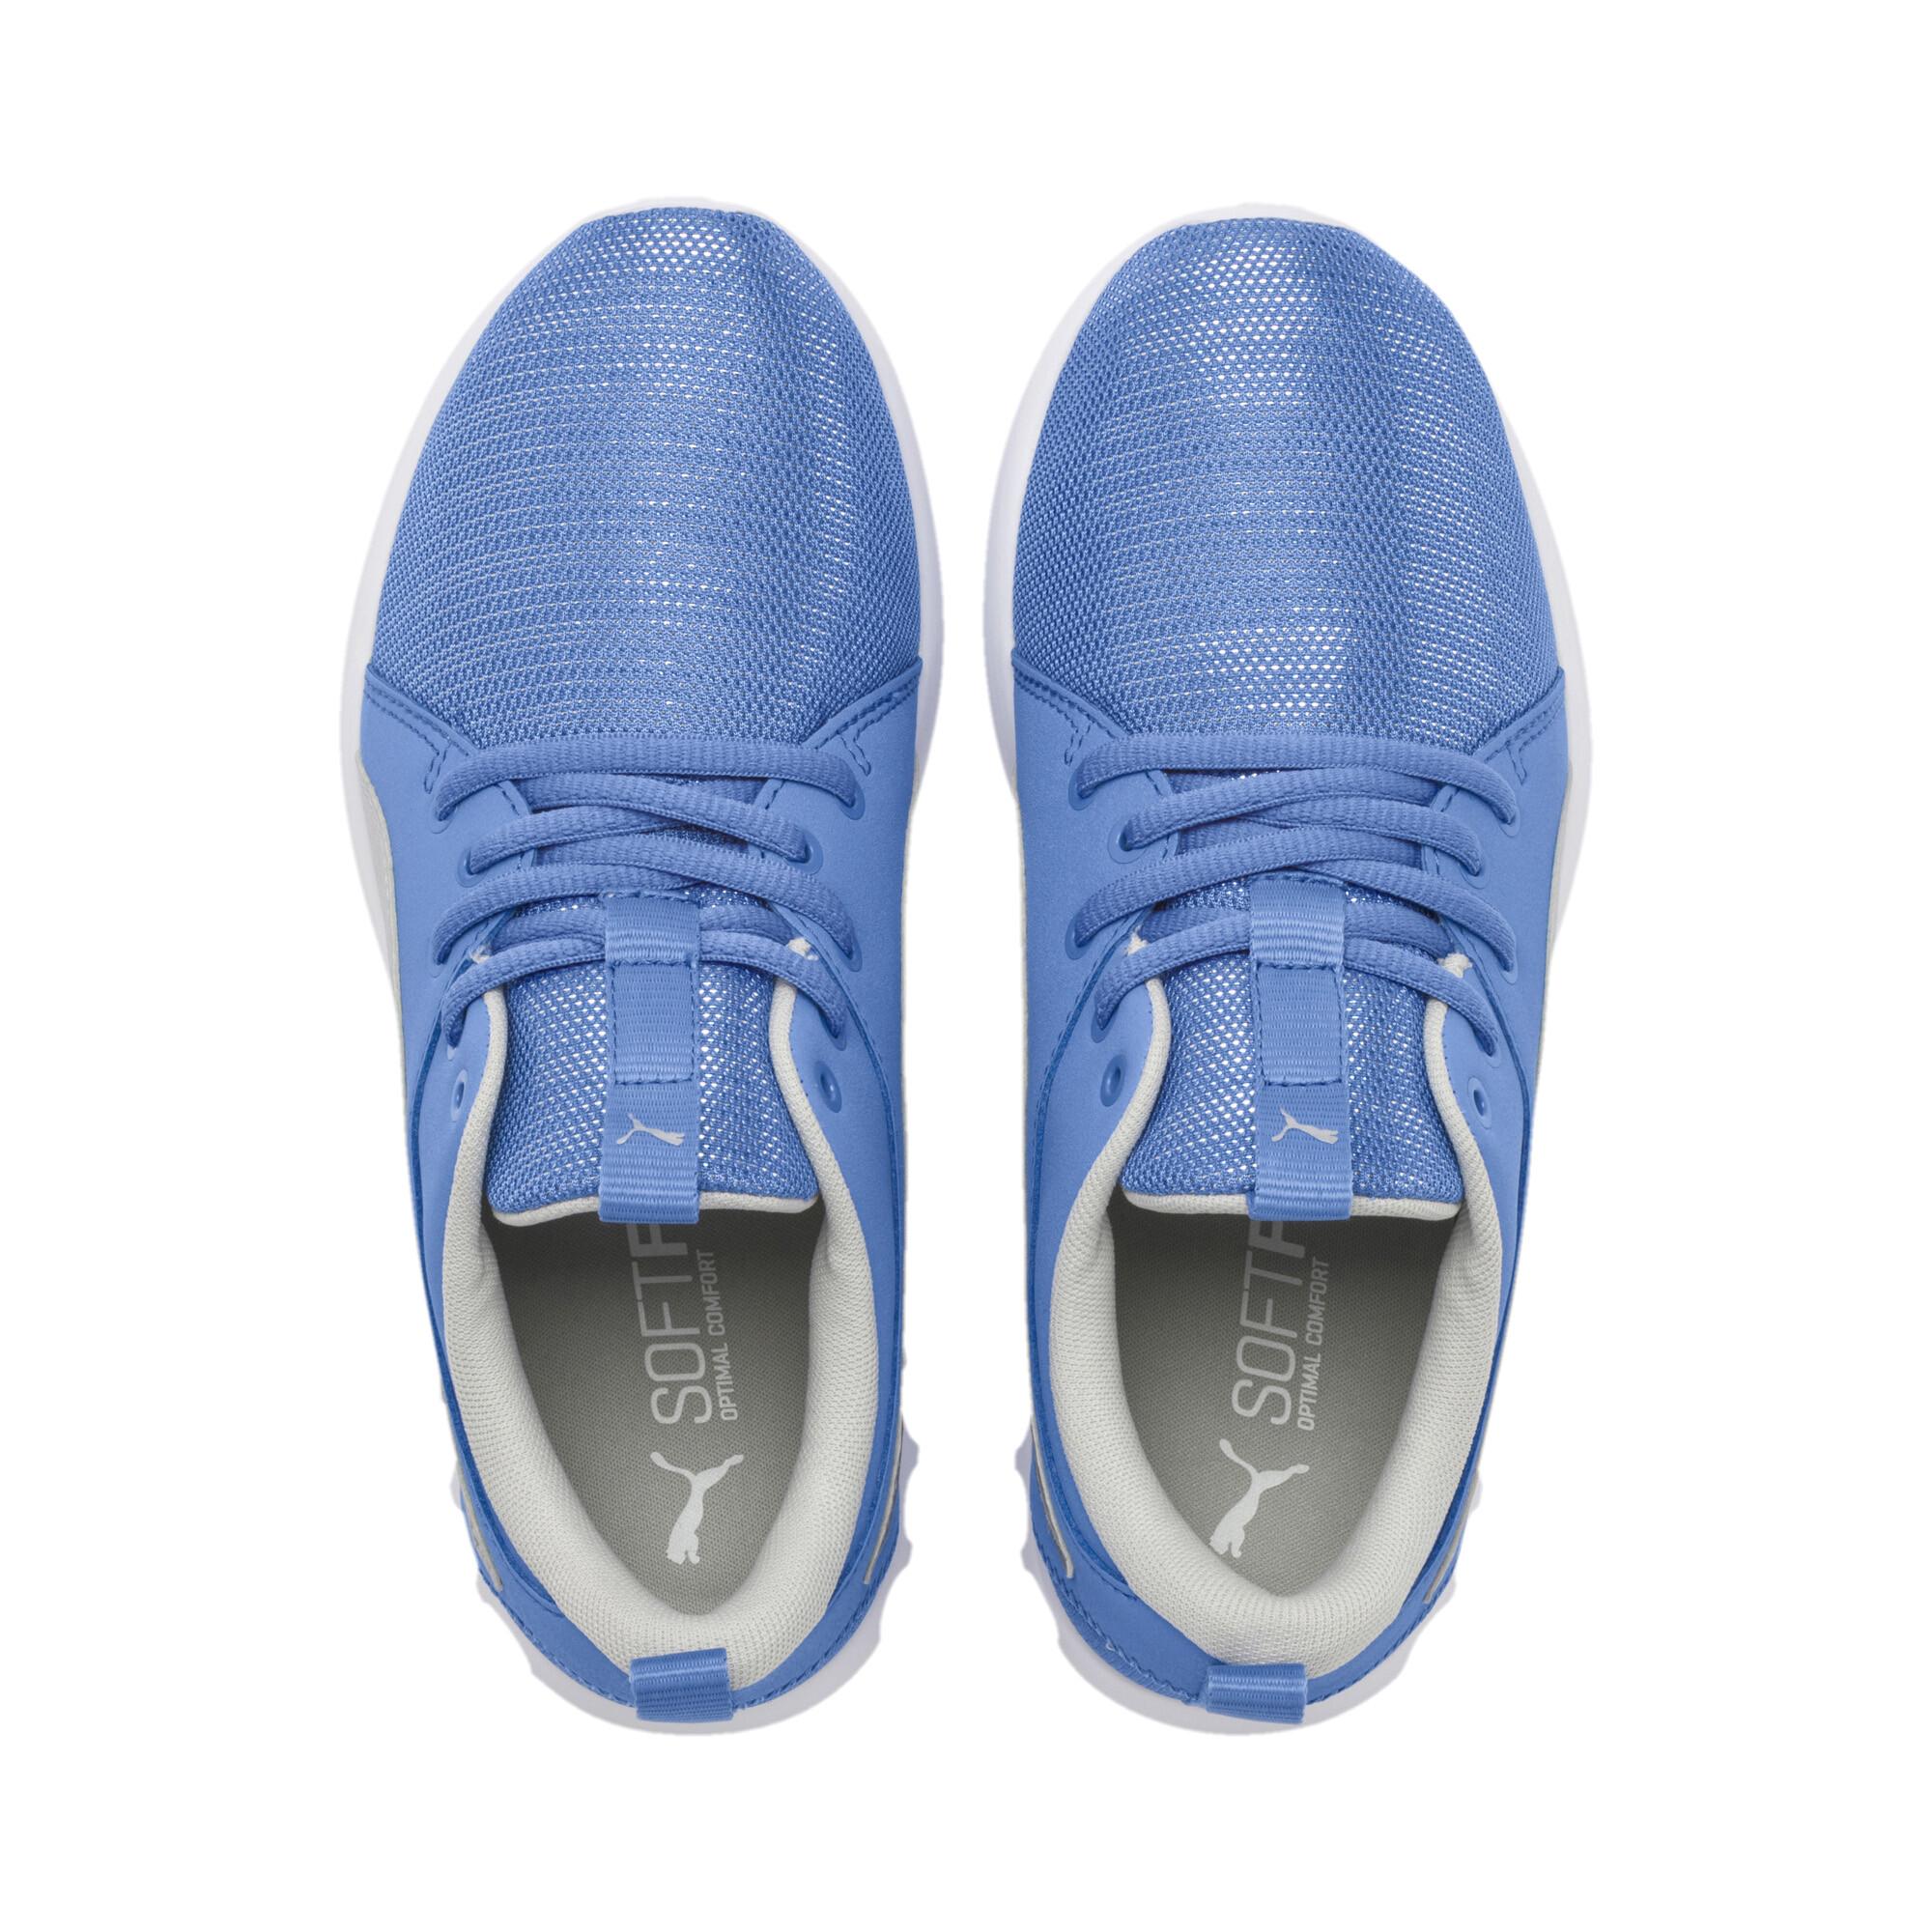 PUMA-Carson-2-Glitz-Shoes-JR-Girls-Shoe-Kids thumbnail 13